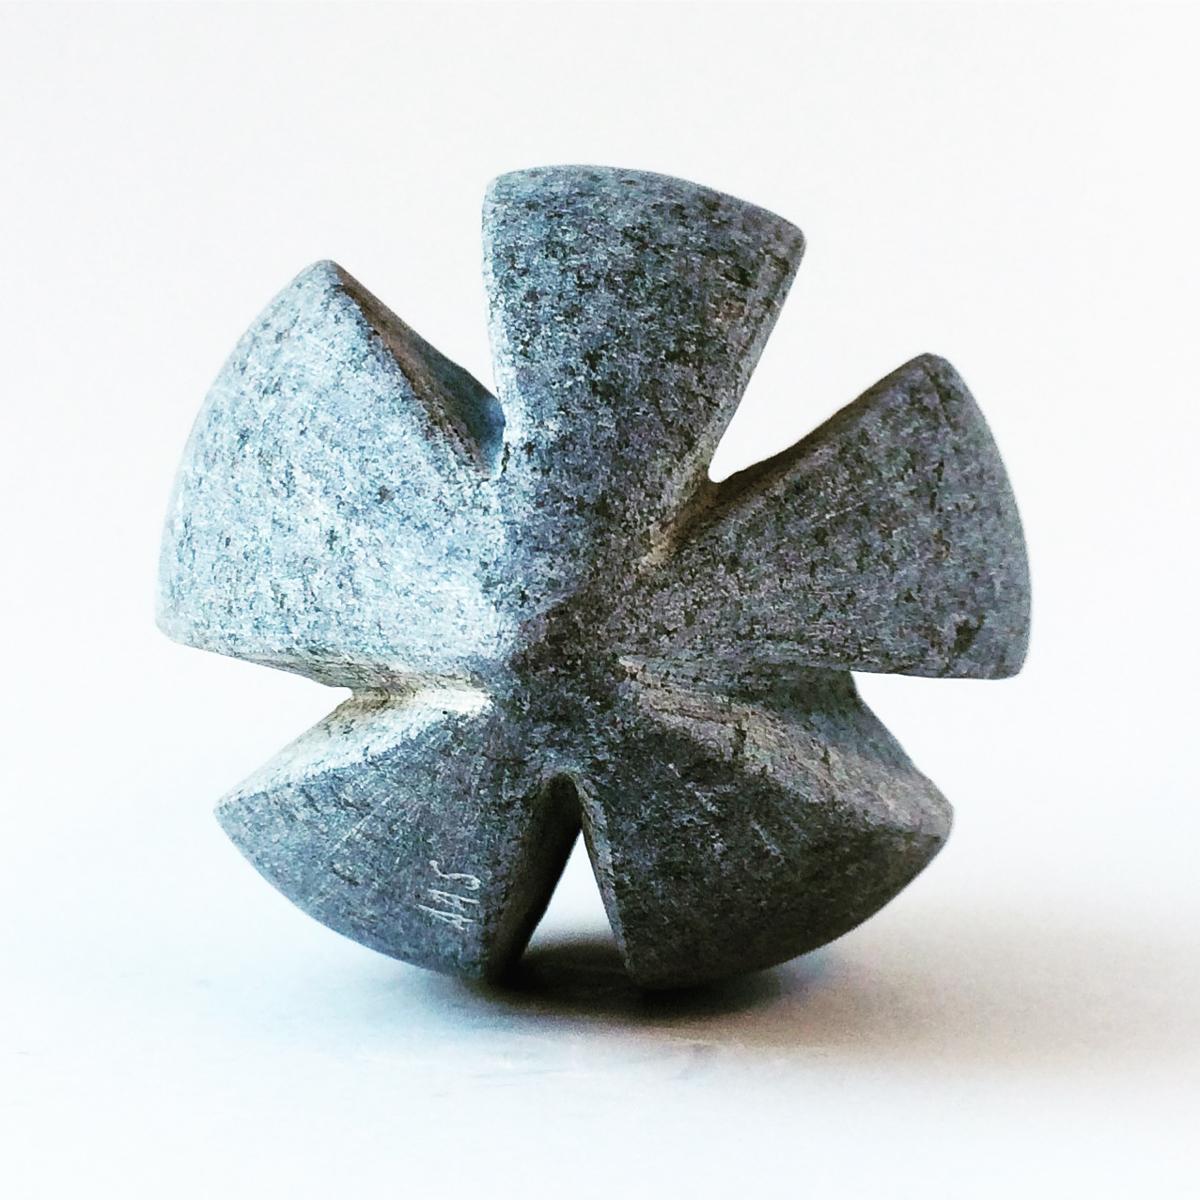 seed_stone_2